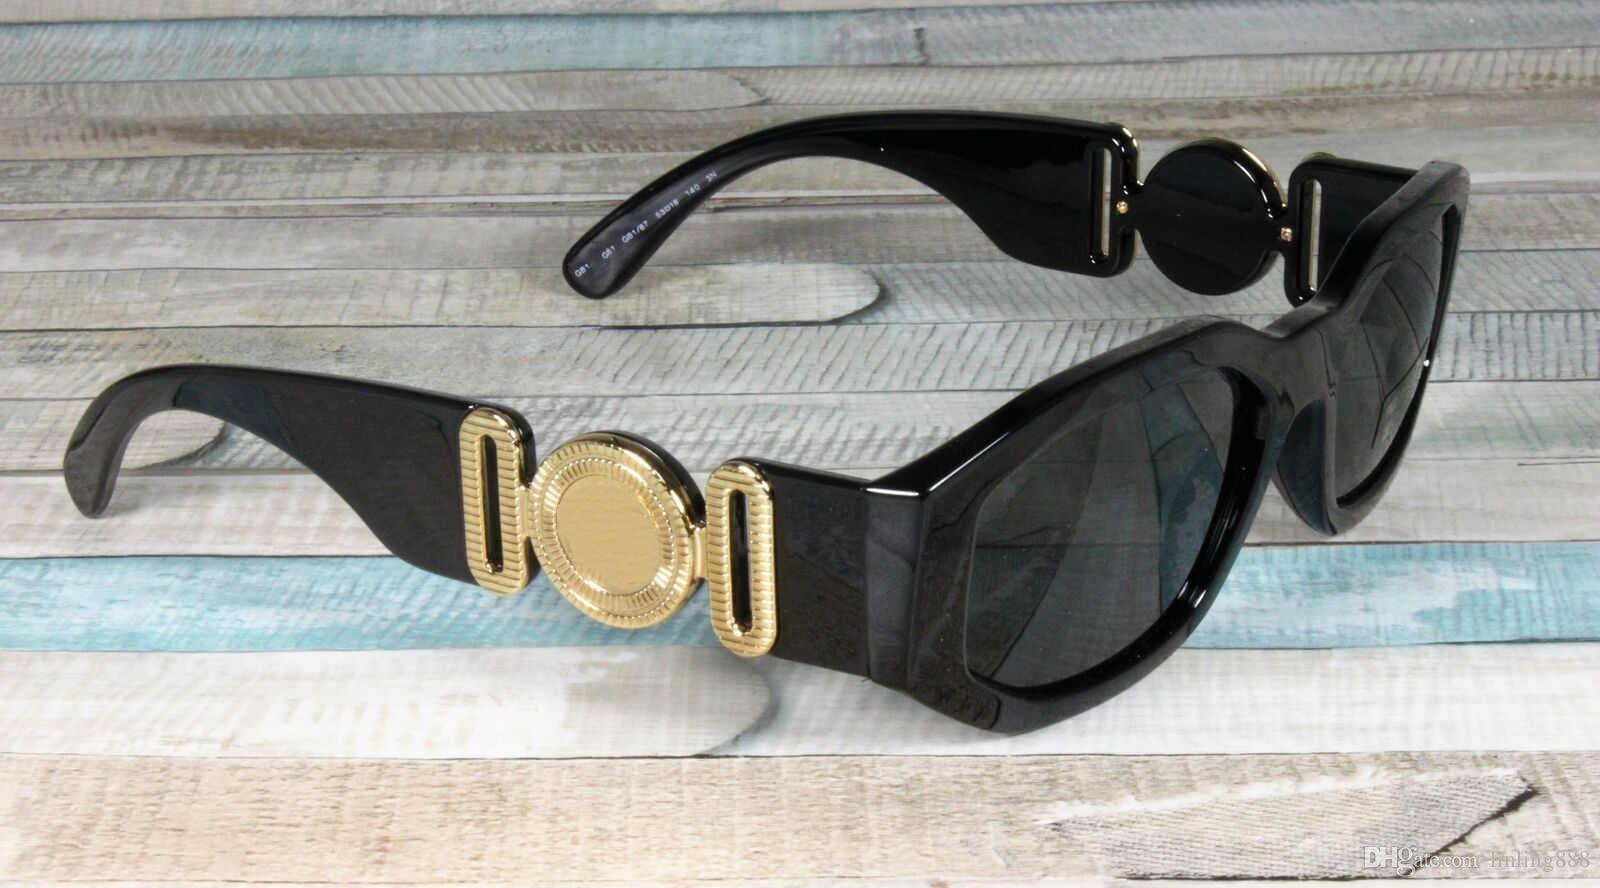 4361 GB1 / 87 Preto / Mens Grey Sunglasses 53 milímetros Unisex óculos escuros de grife de luxo óculos de sol marca de moda para homens Mulher dos vidros